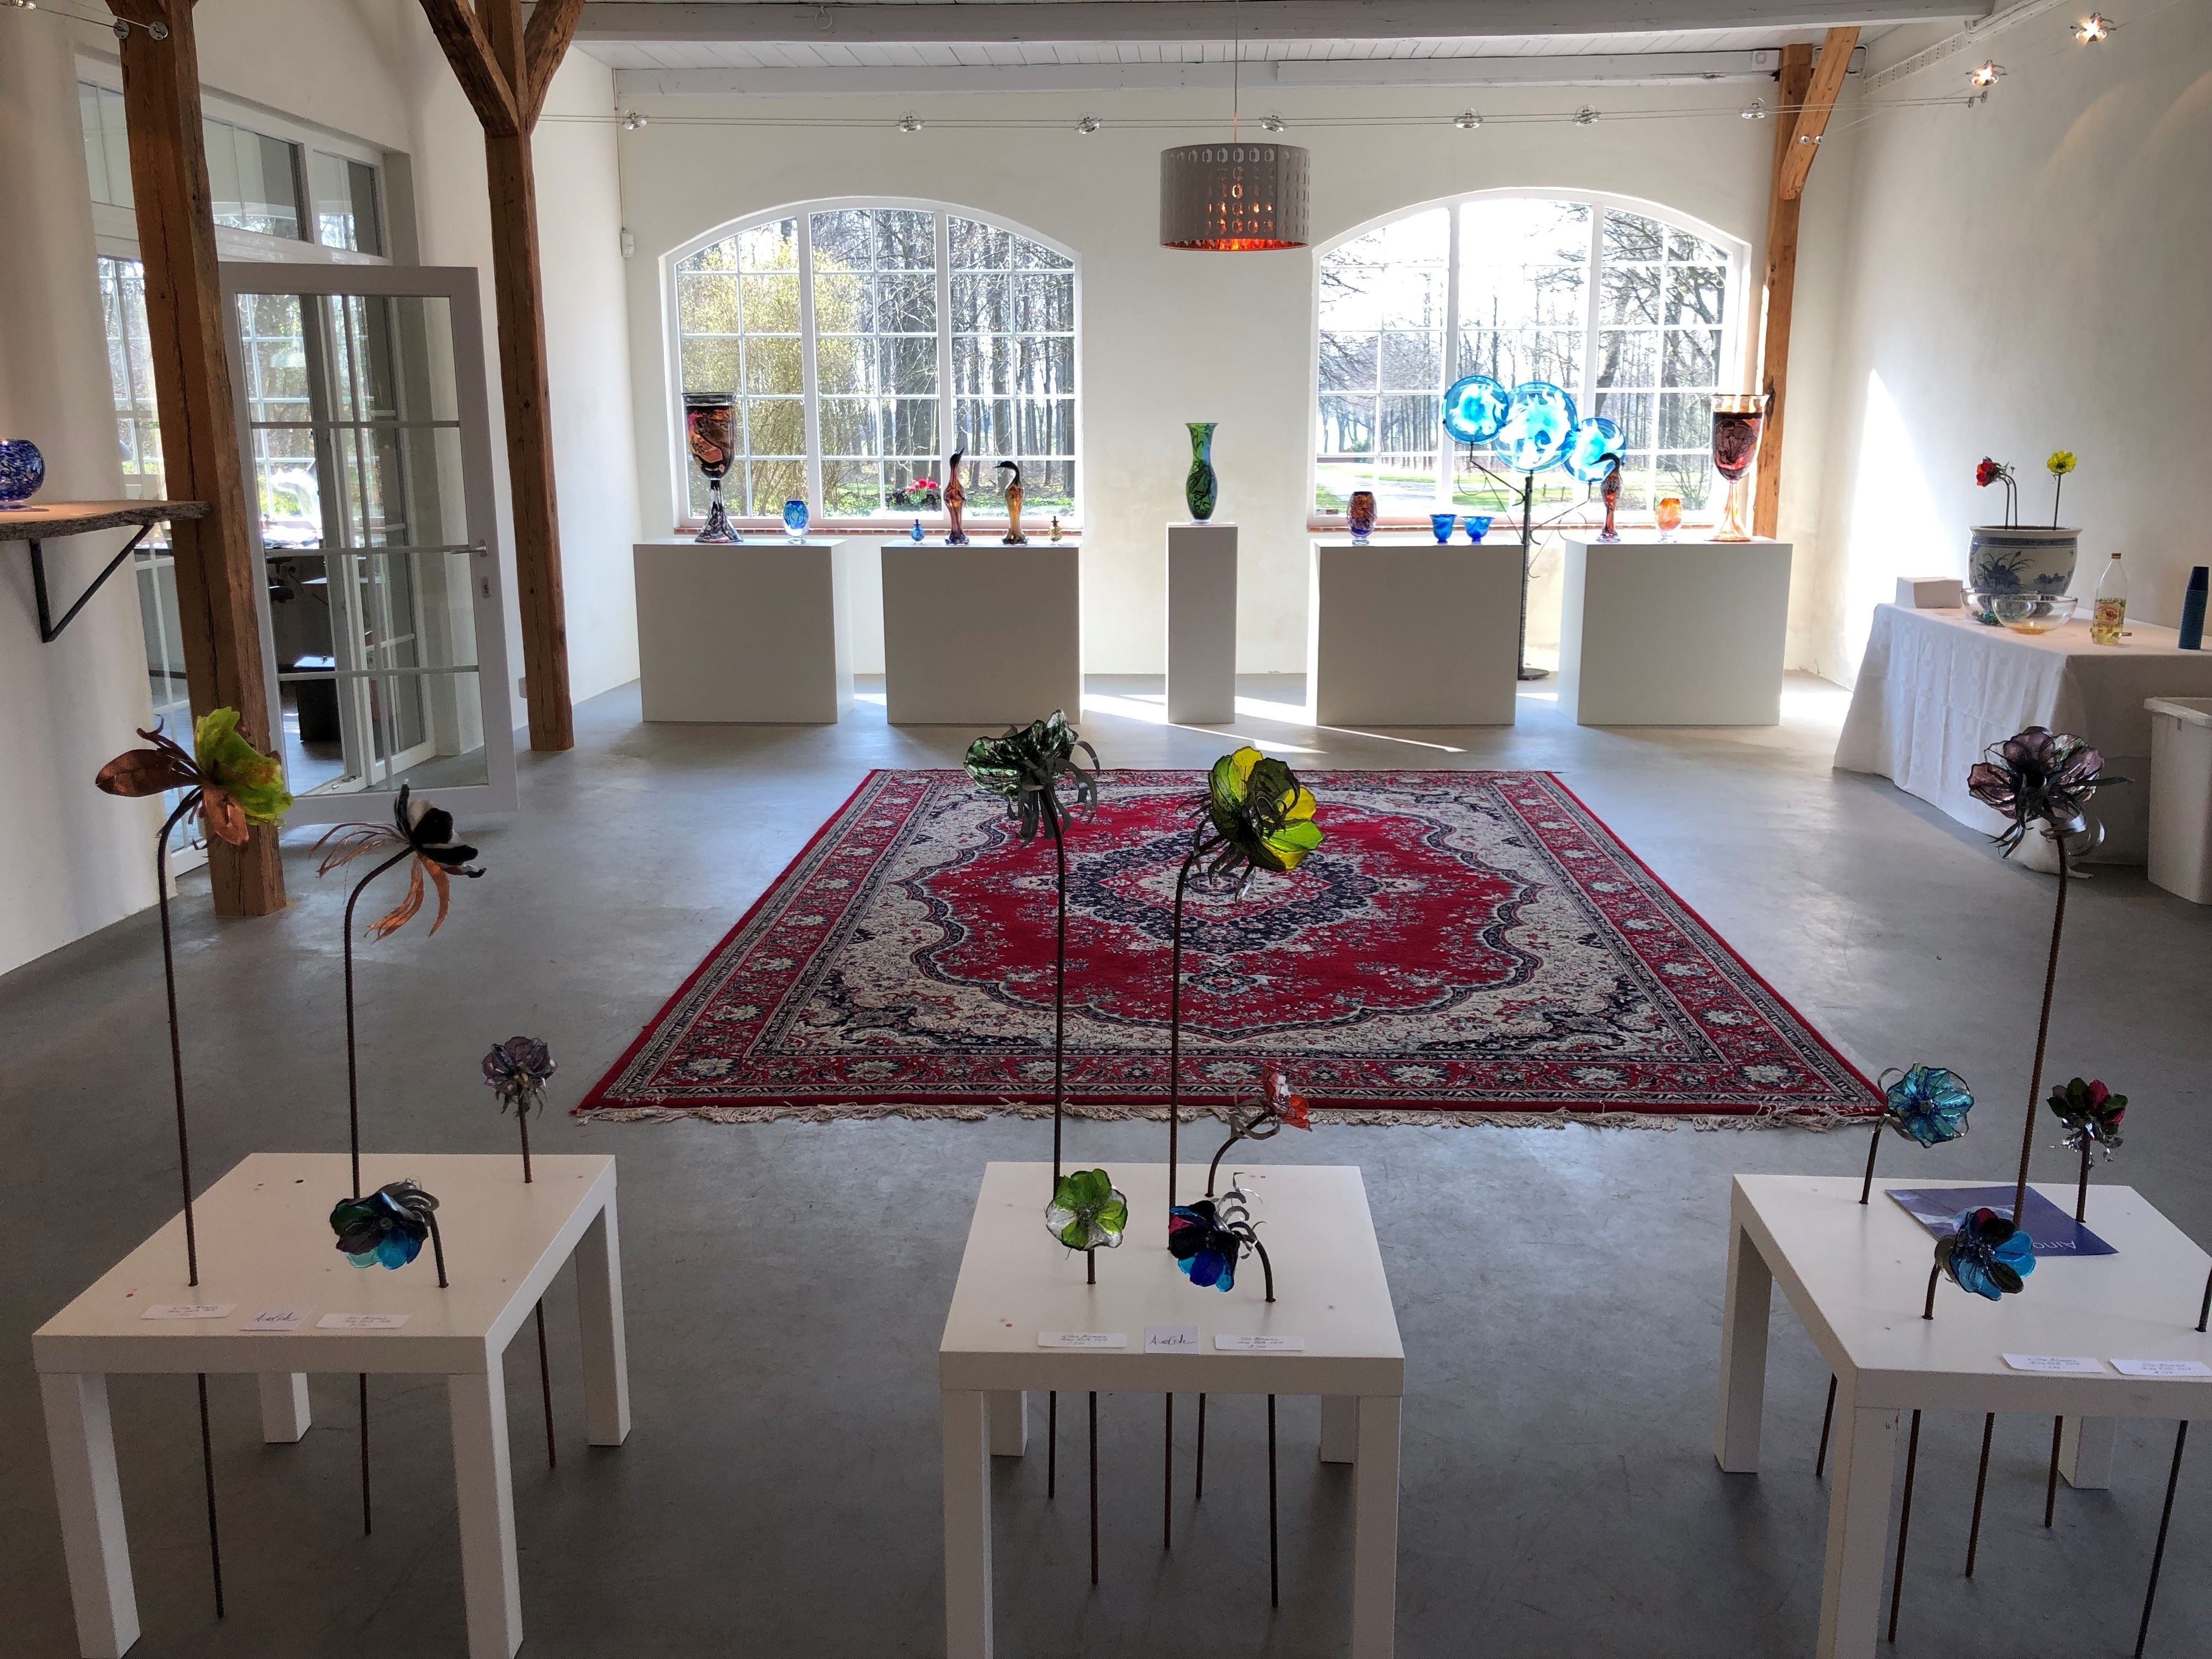 Art Exhibition - Astrid Gate Ateljé